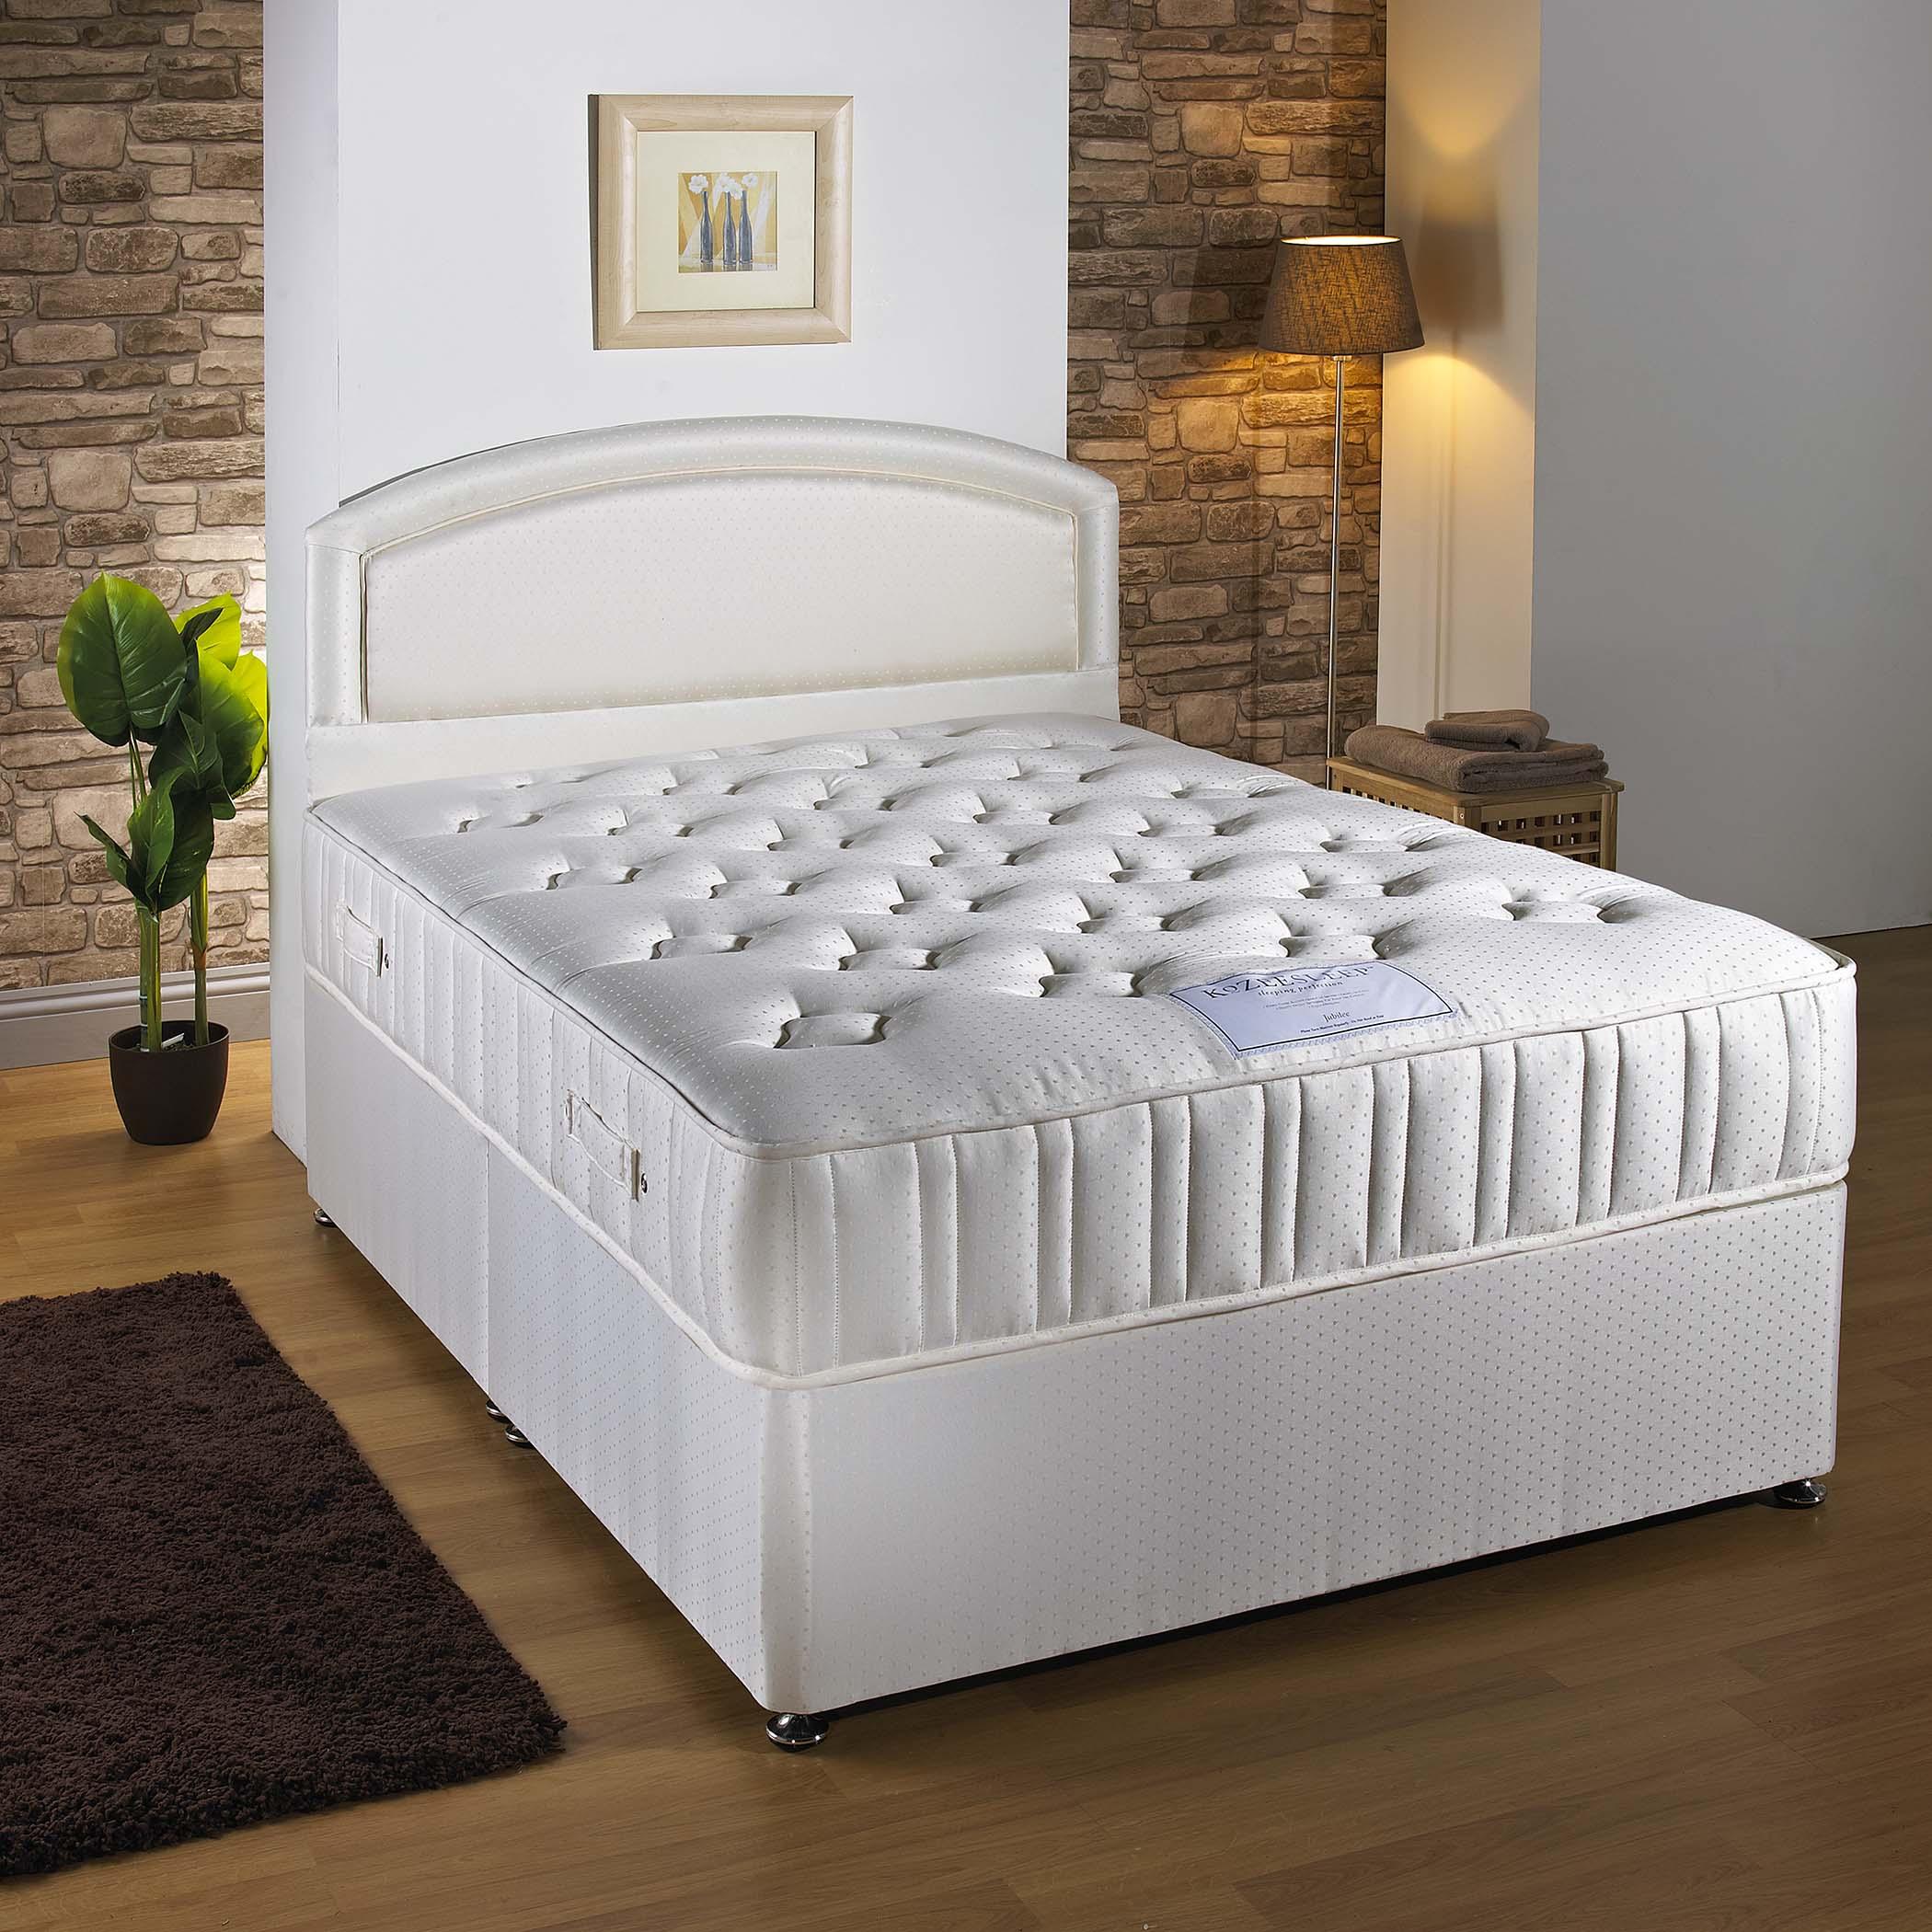 dream sofas wishaw folding sofa bed mattress india divan beds